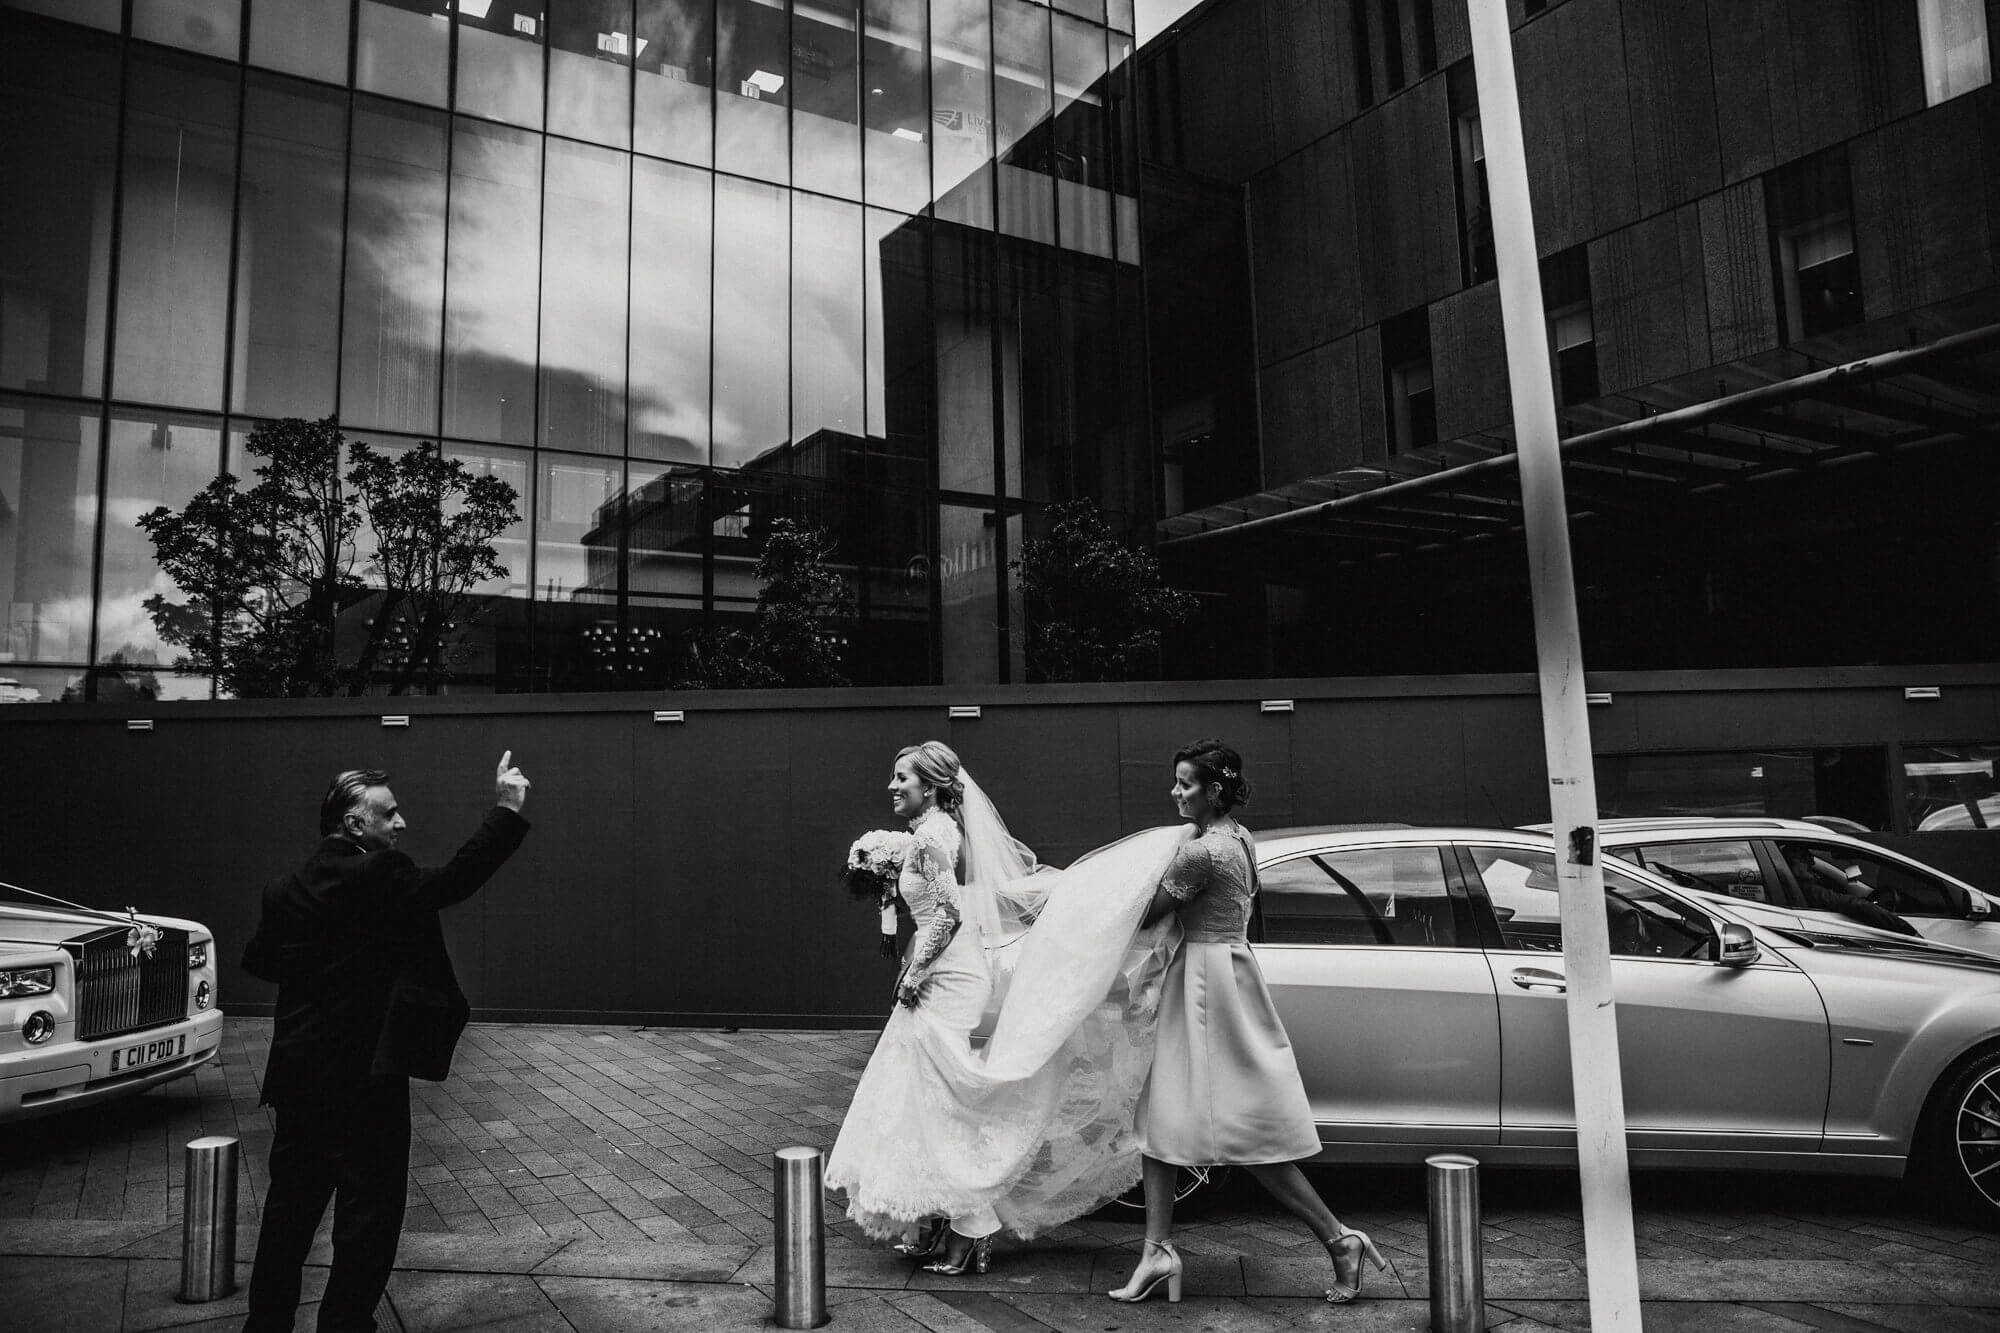 Manchester_Wedding_Photographer_008.jpg